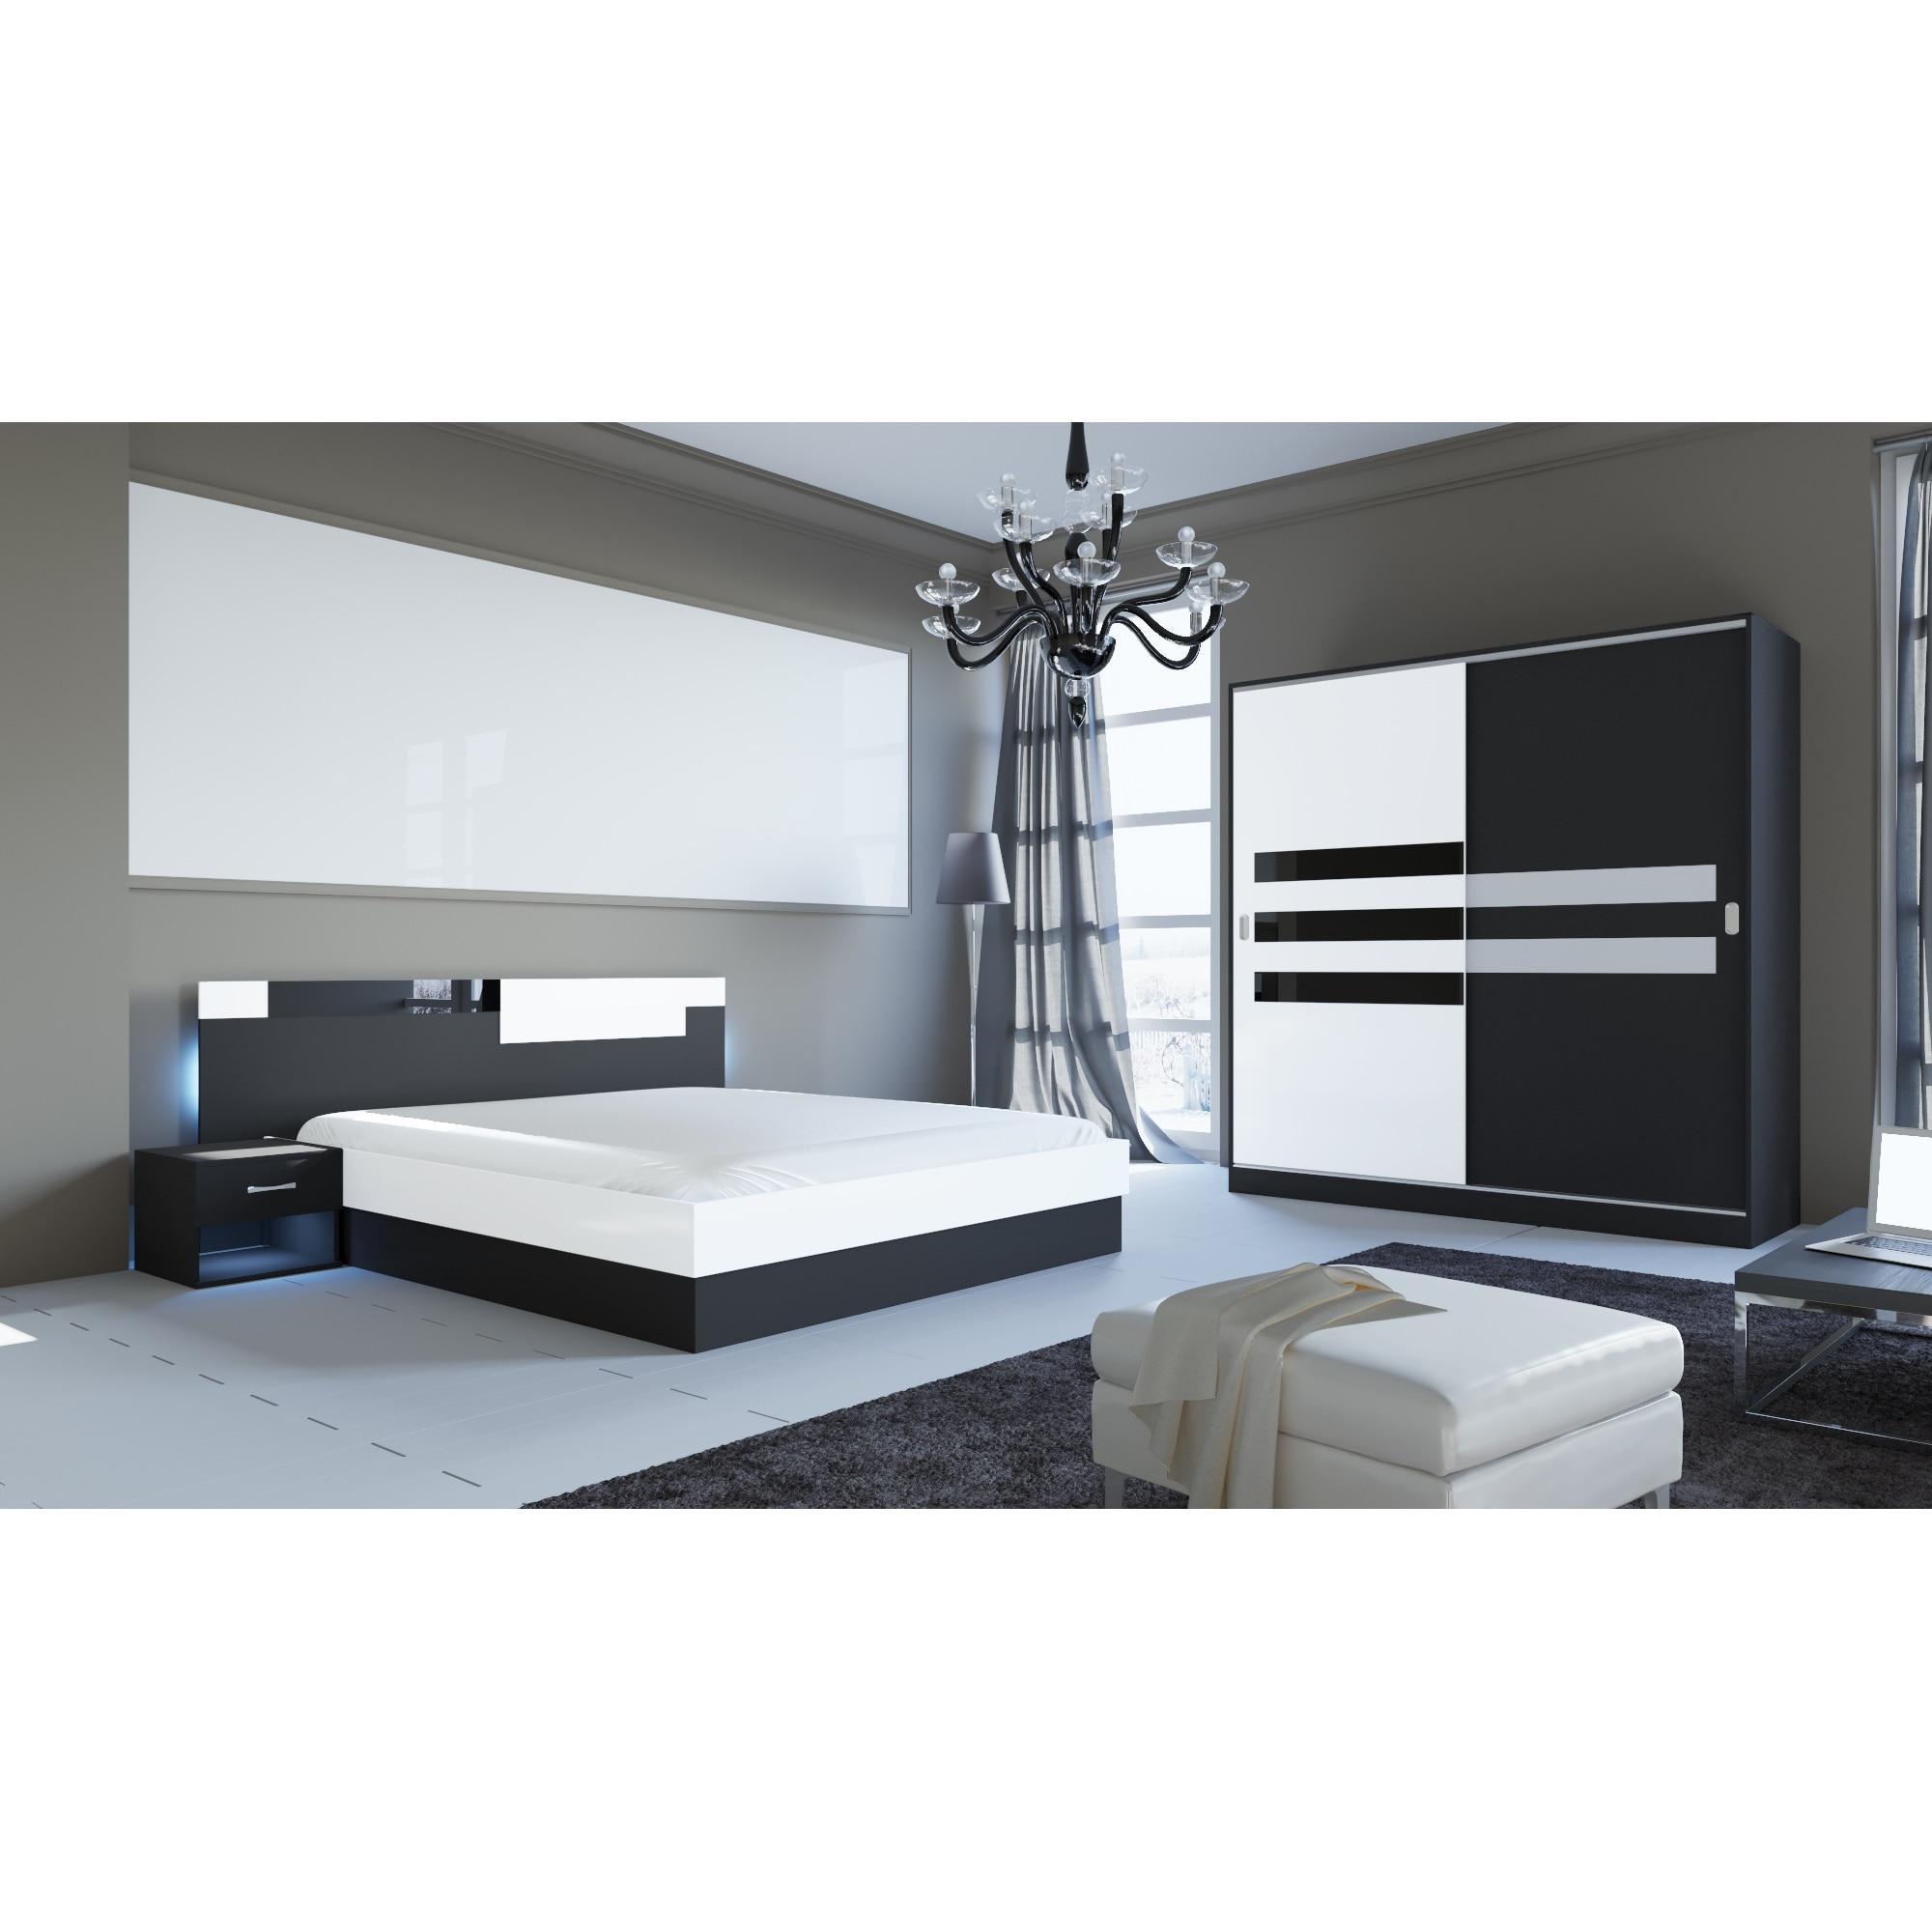 Fotografie Dormitor Irim Klara, Pat 160x200 cm, Dulap usi glisante 180x59,5x191 cm, 2 Noptiere, Alb/Negru